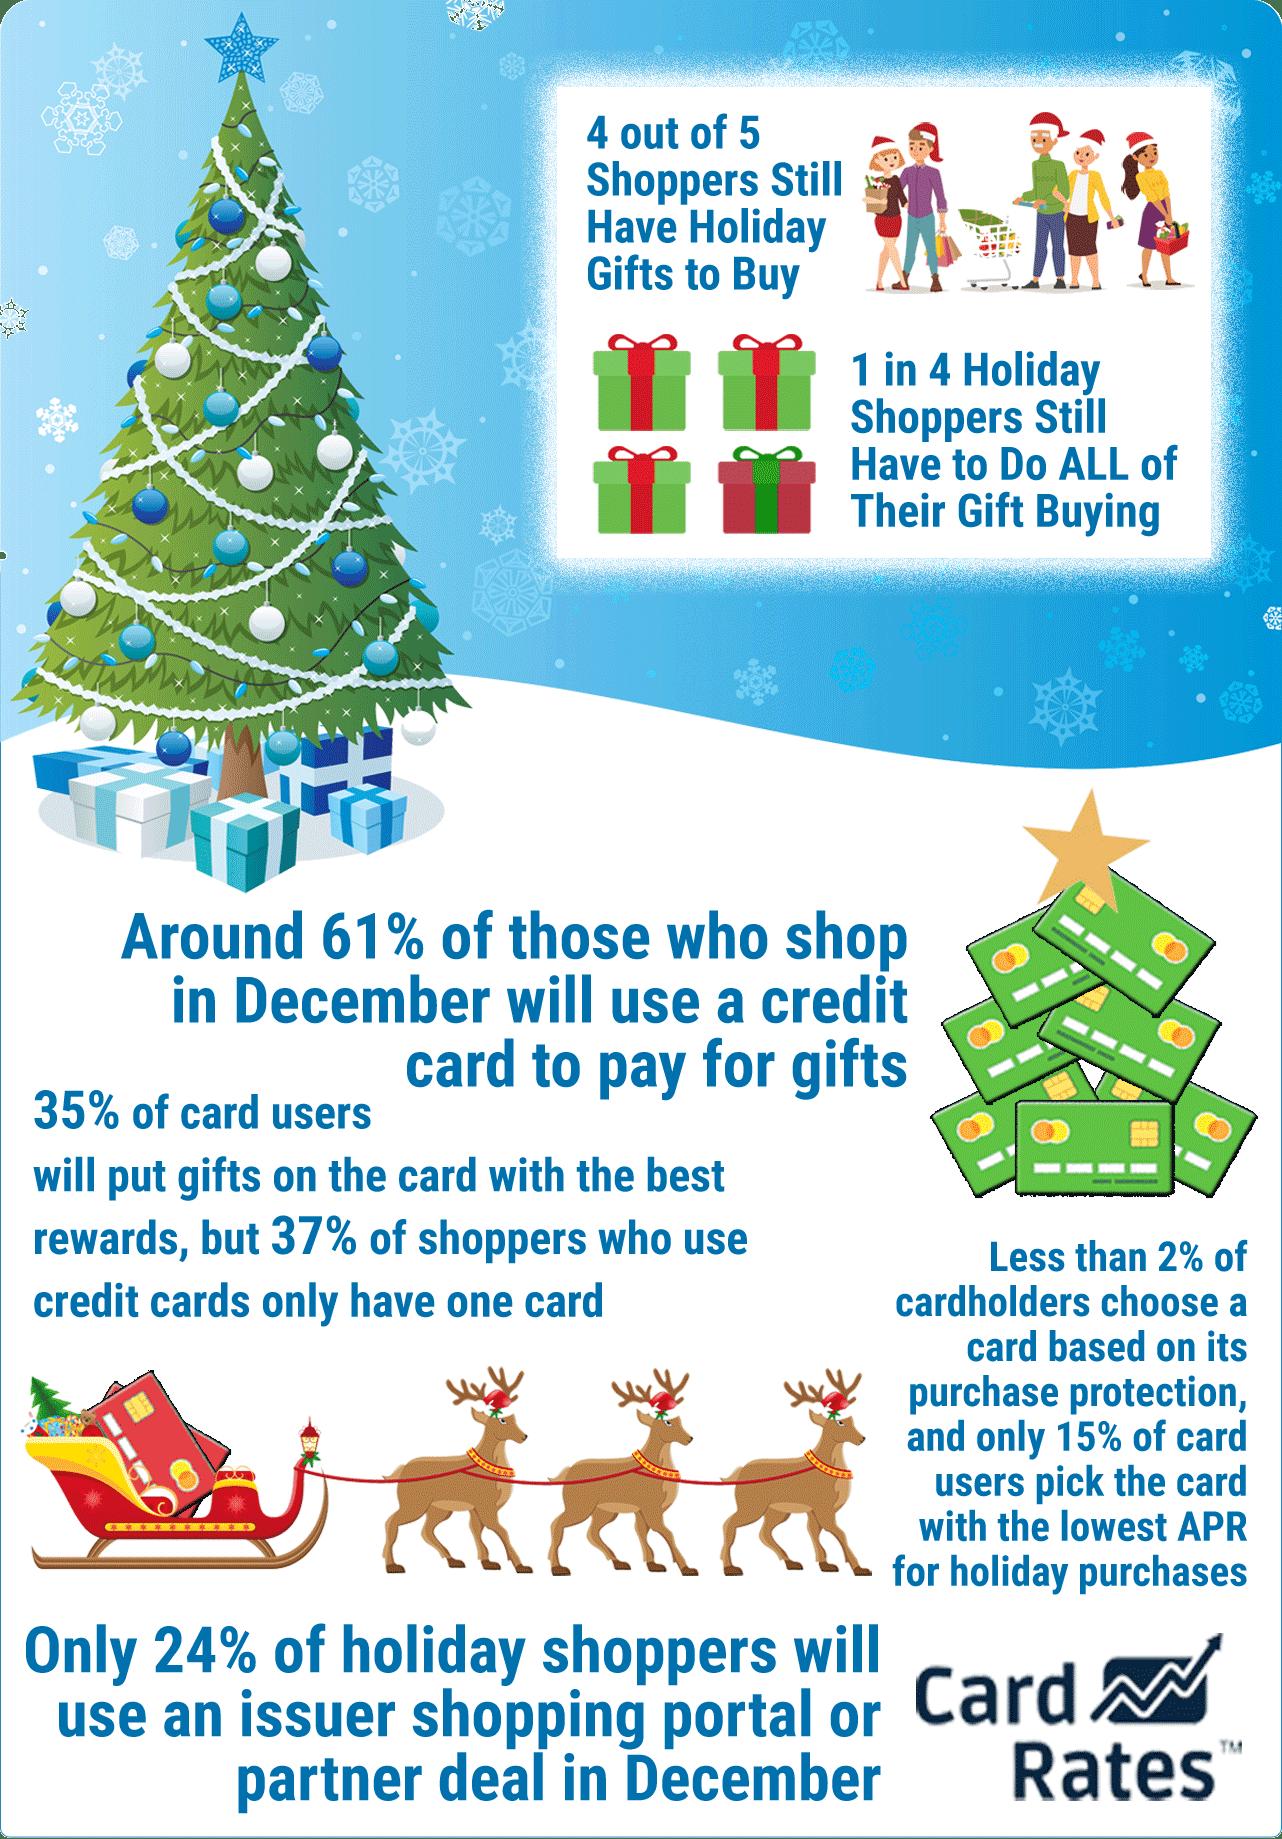 CardRates.com 2018 Holiday Gift Shopping Survey